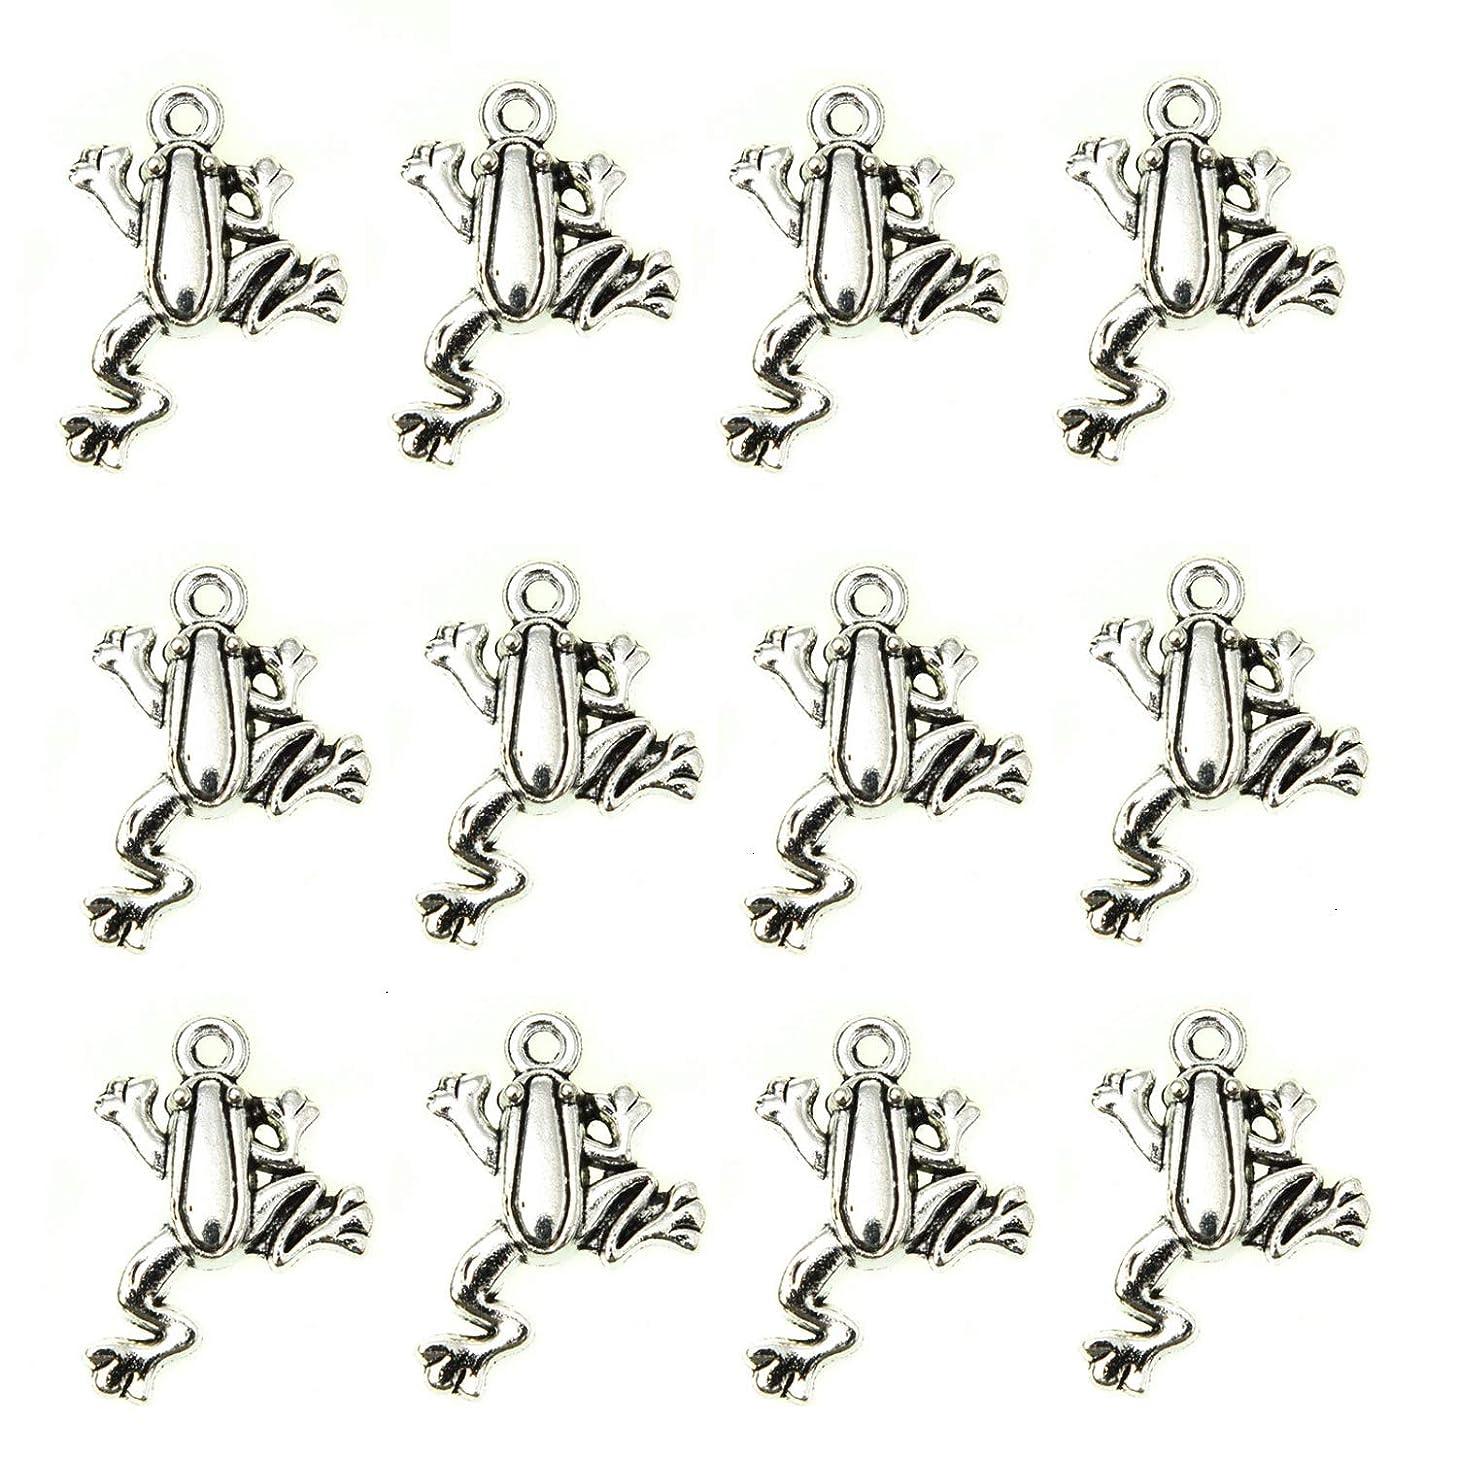 Monrocco 100 Pcs Antique Silver Frog Charms Pendant Bulk for Bracelets Jewelry Making